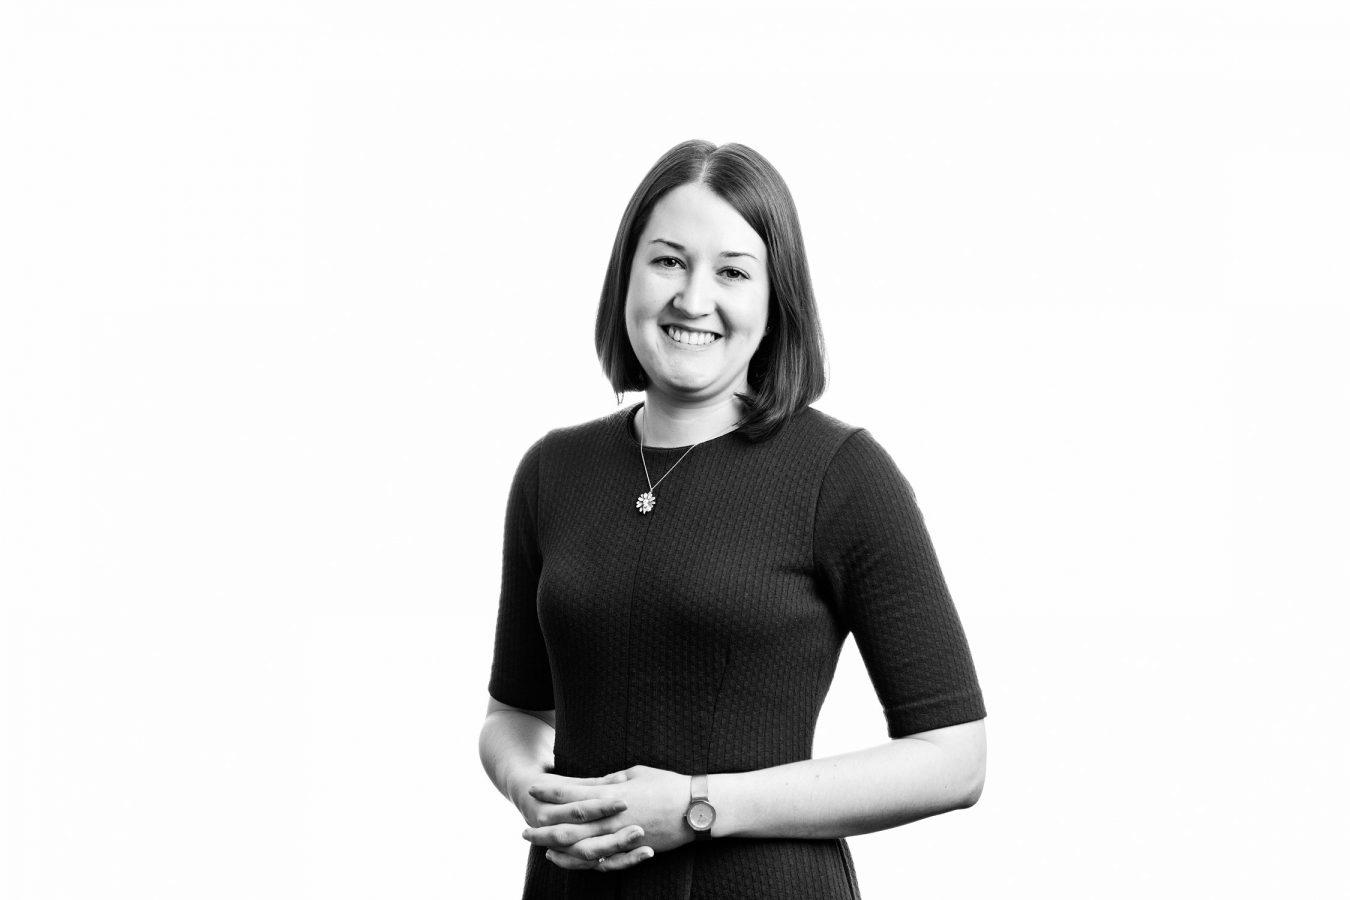 female-office-staff-portrait-studio-black-and-white